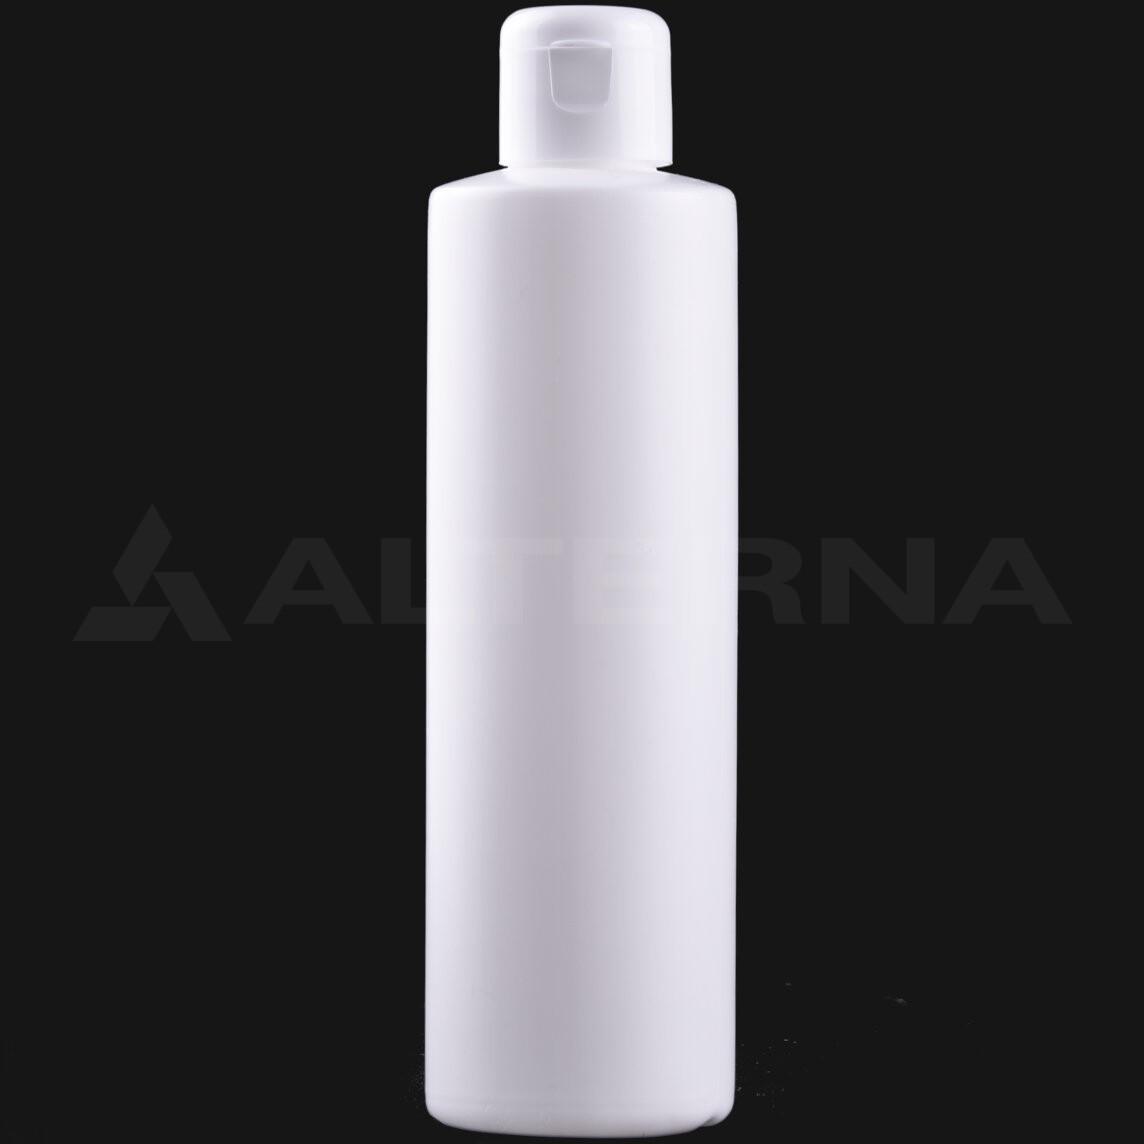 250 ml HDPE Bottle with 24 mm Flip Top Cap